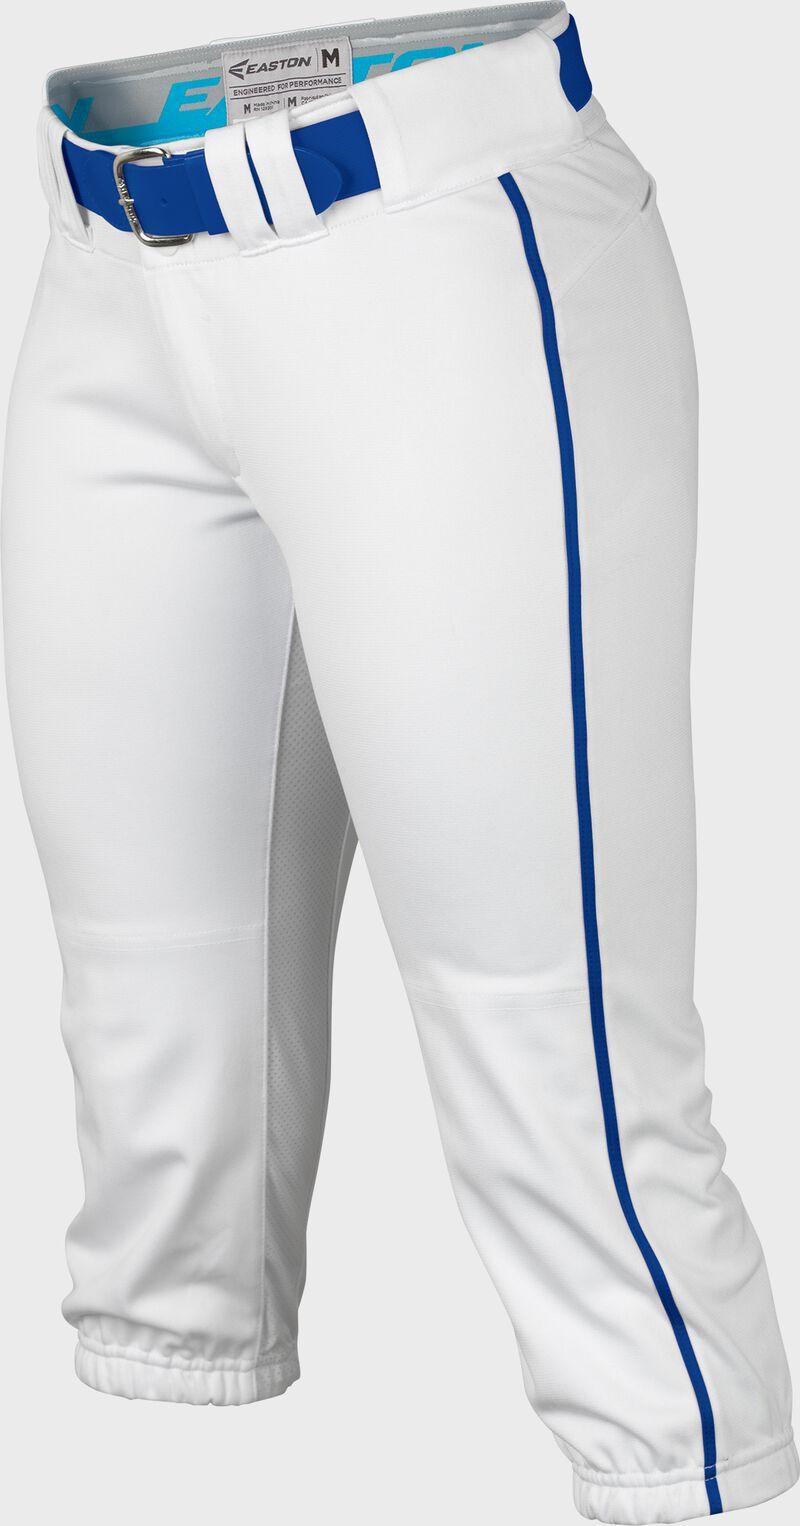 Easton Prowess Softball Pant Women's Piped WHITE/ROYAL  XXL